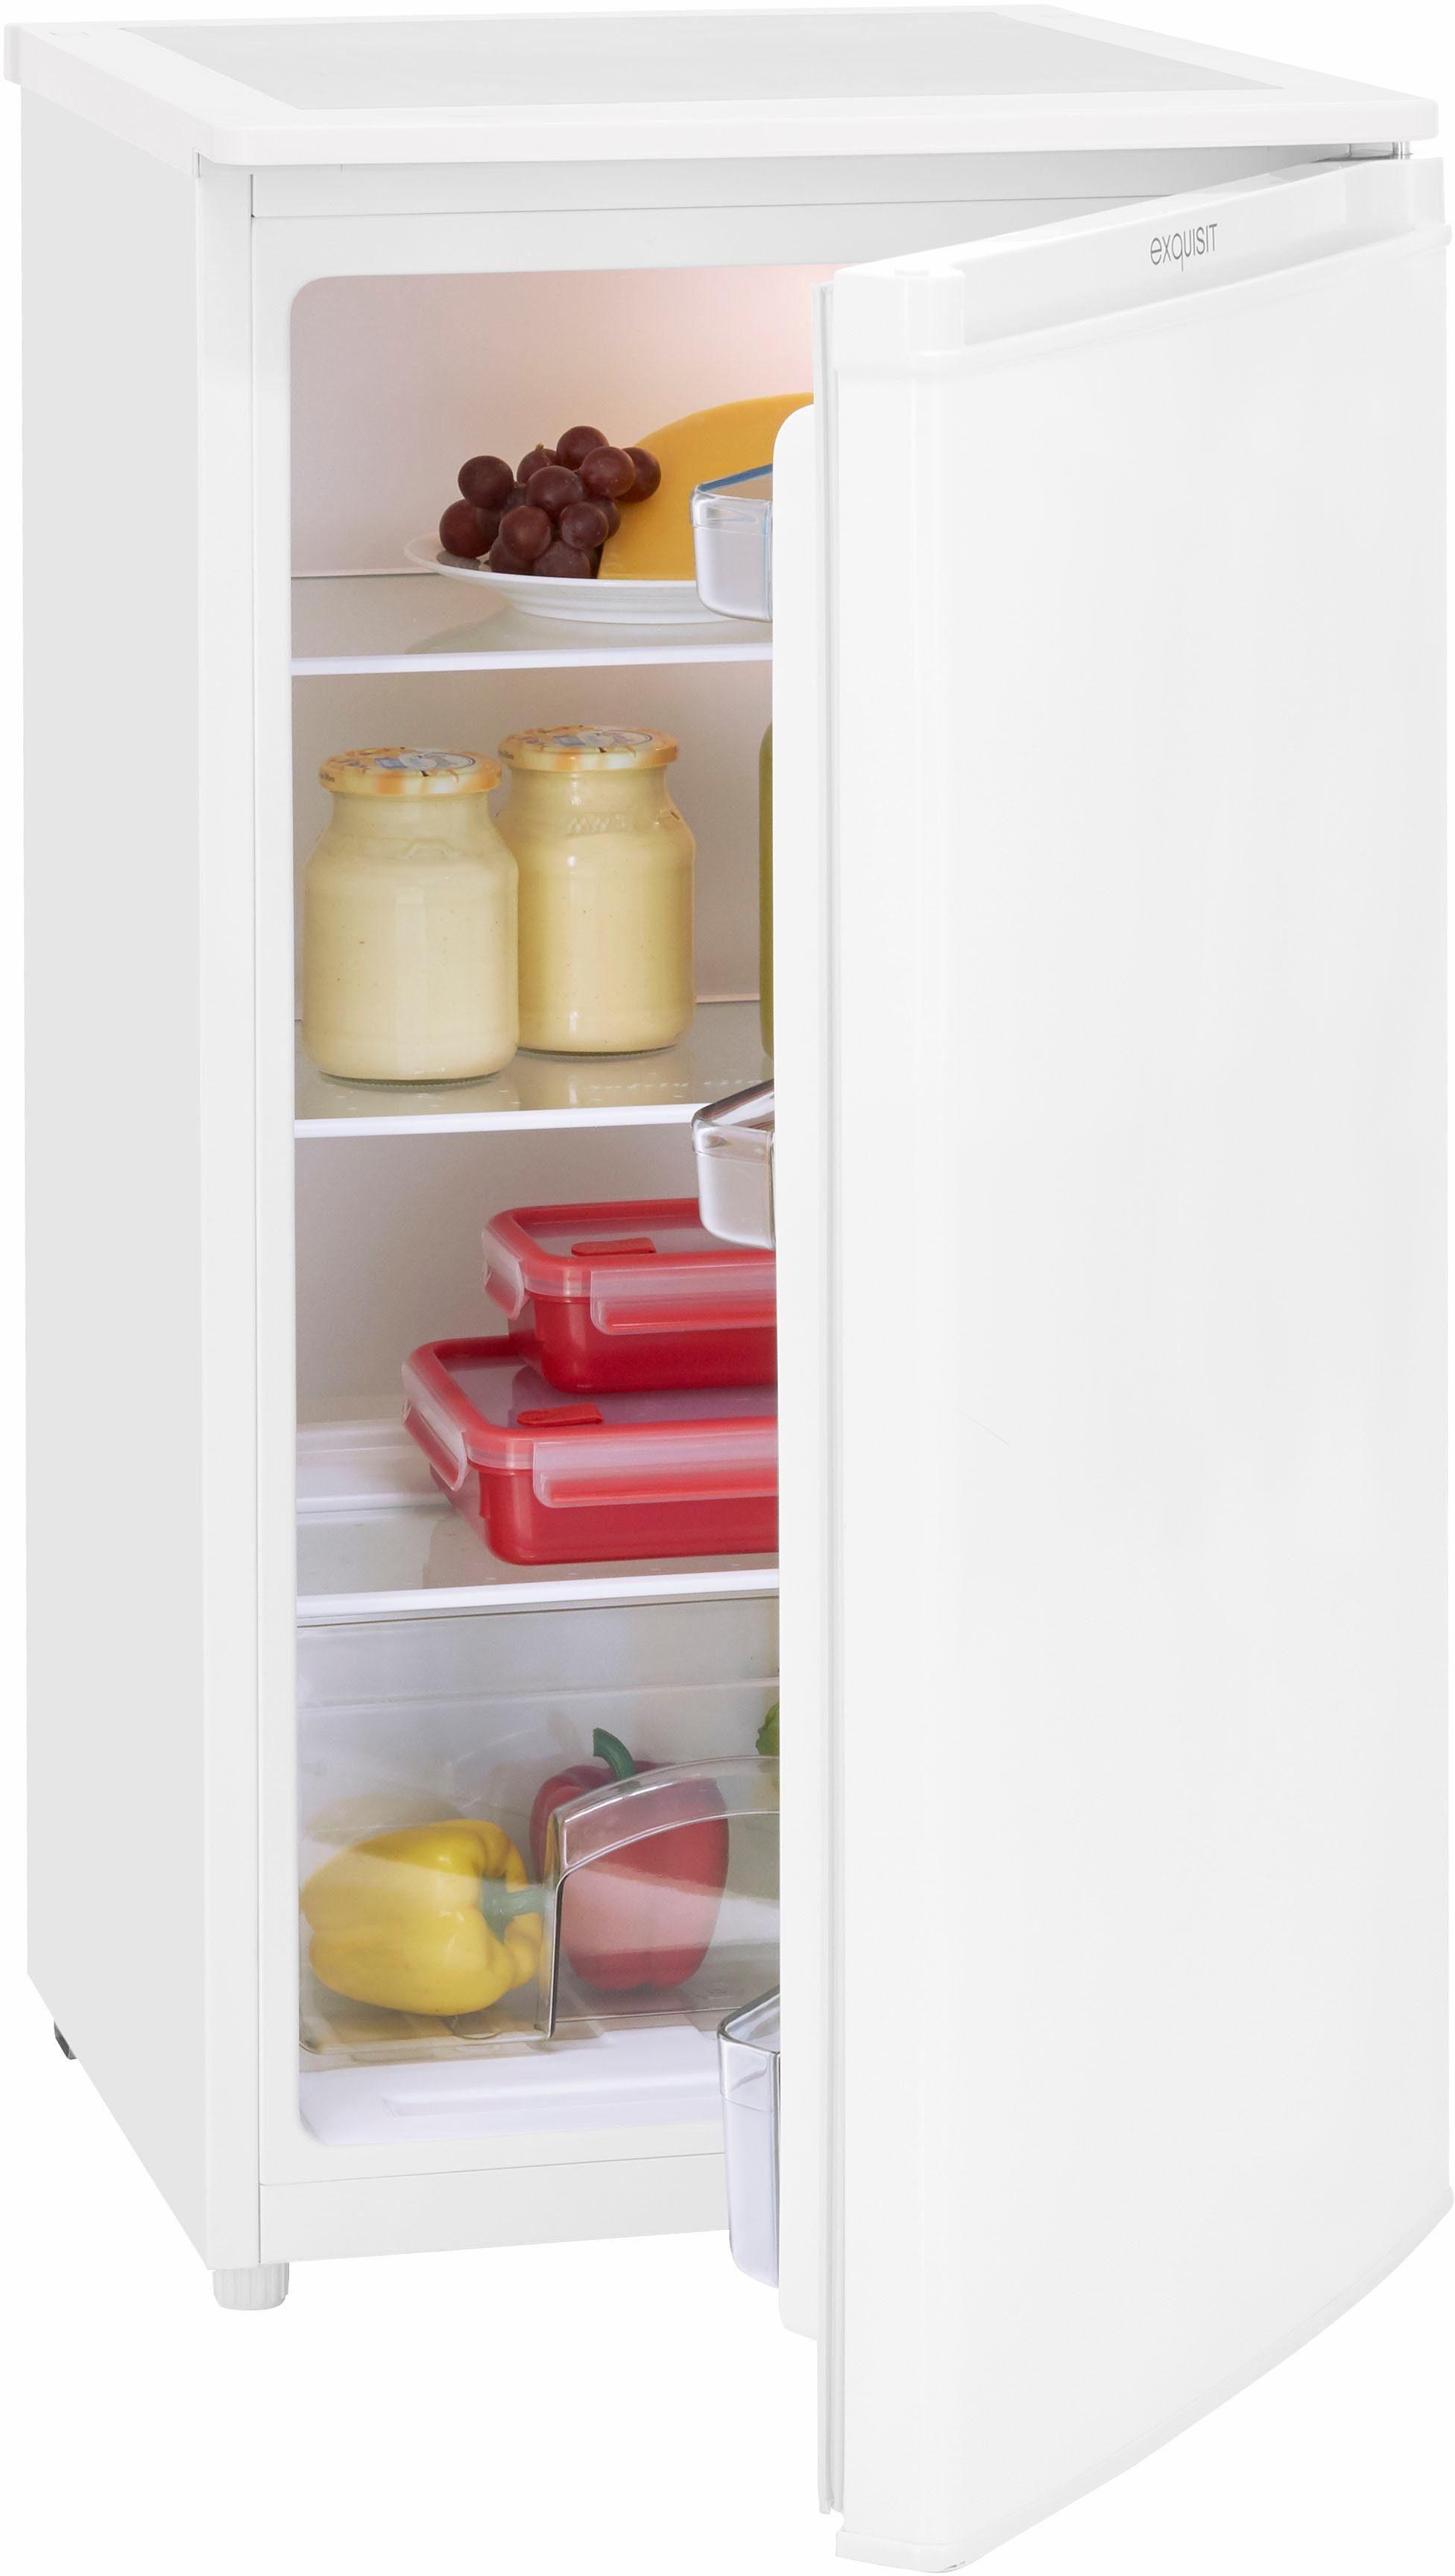 Exquisit Kühlschrank KS 116 KS 116-4.2 RVA++ Top, 85 cm hoch, 48 cm breit